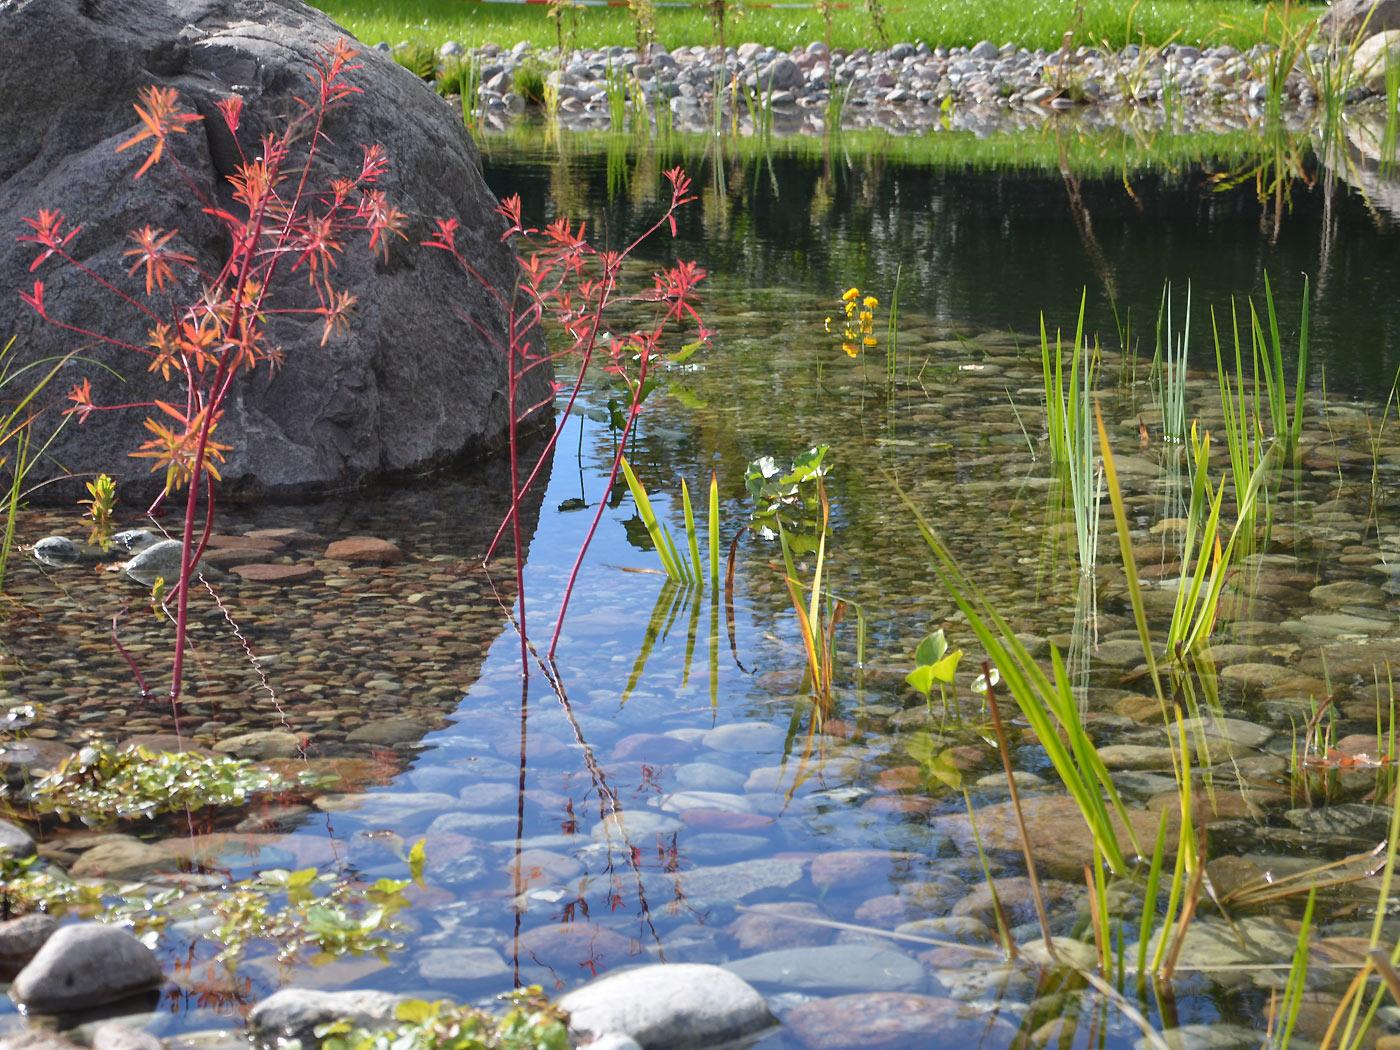 Schwimmteich Uferzone Schwimmteich Uferzone